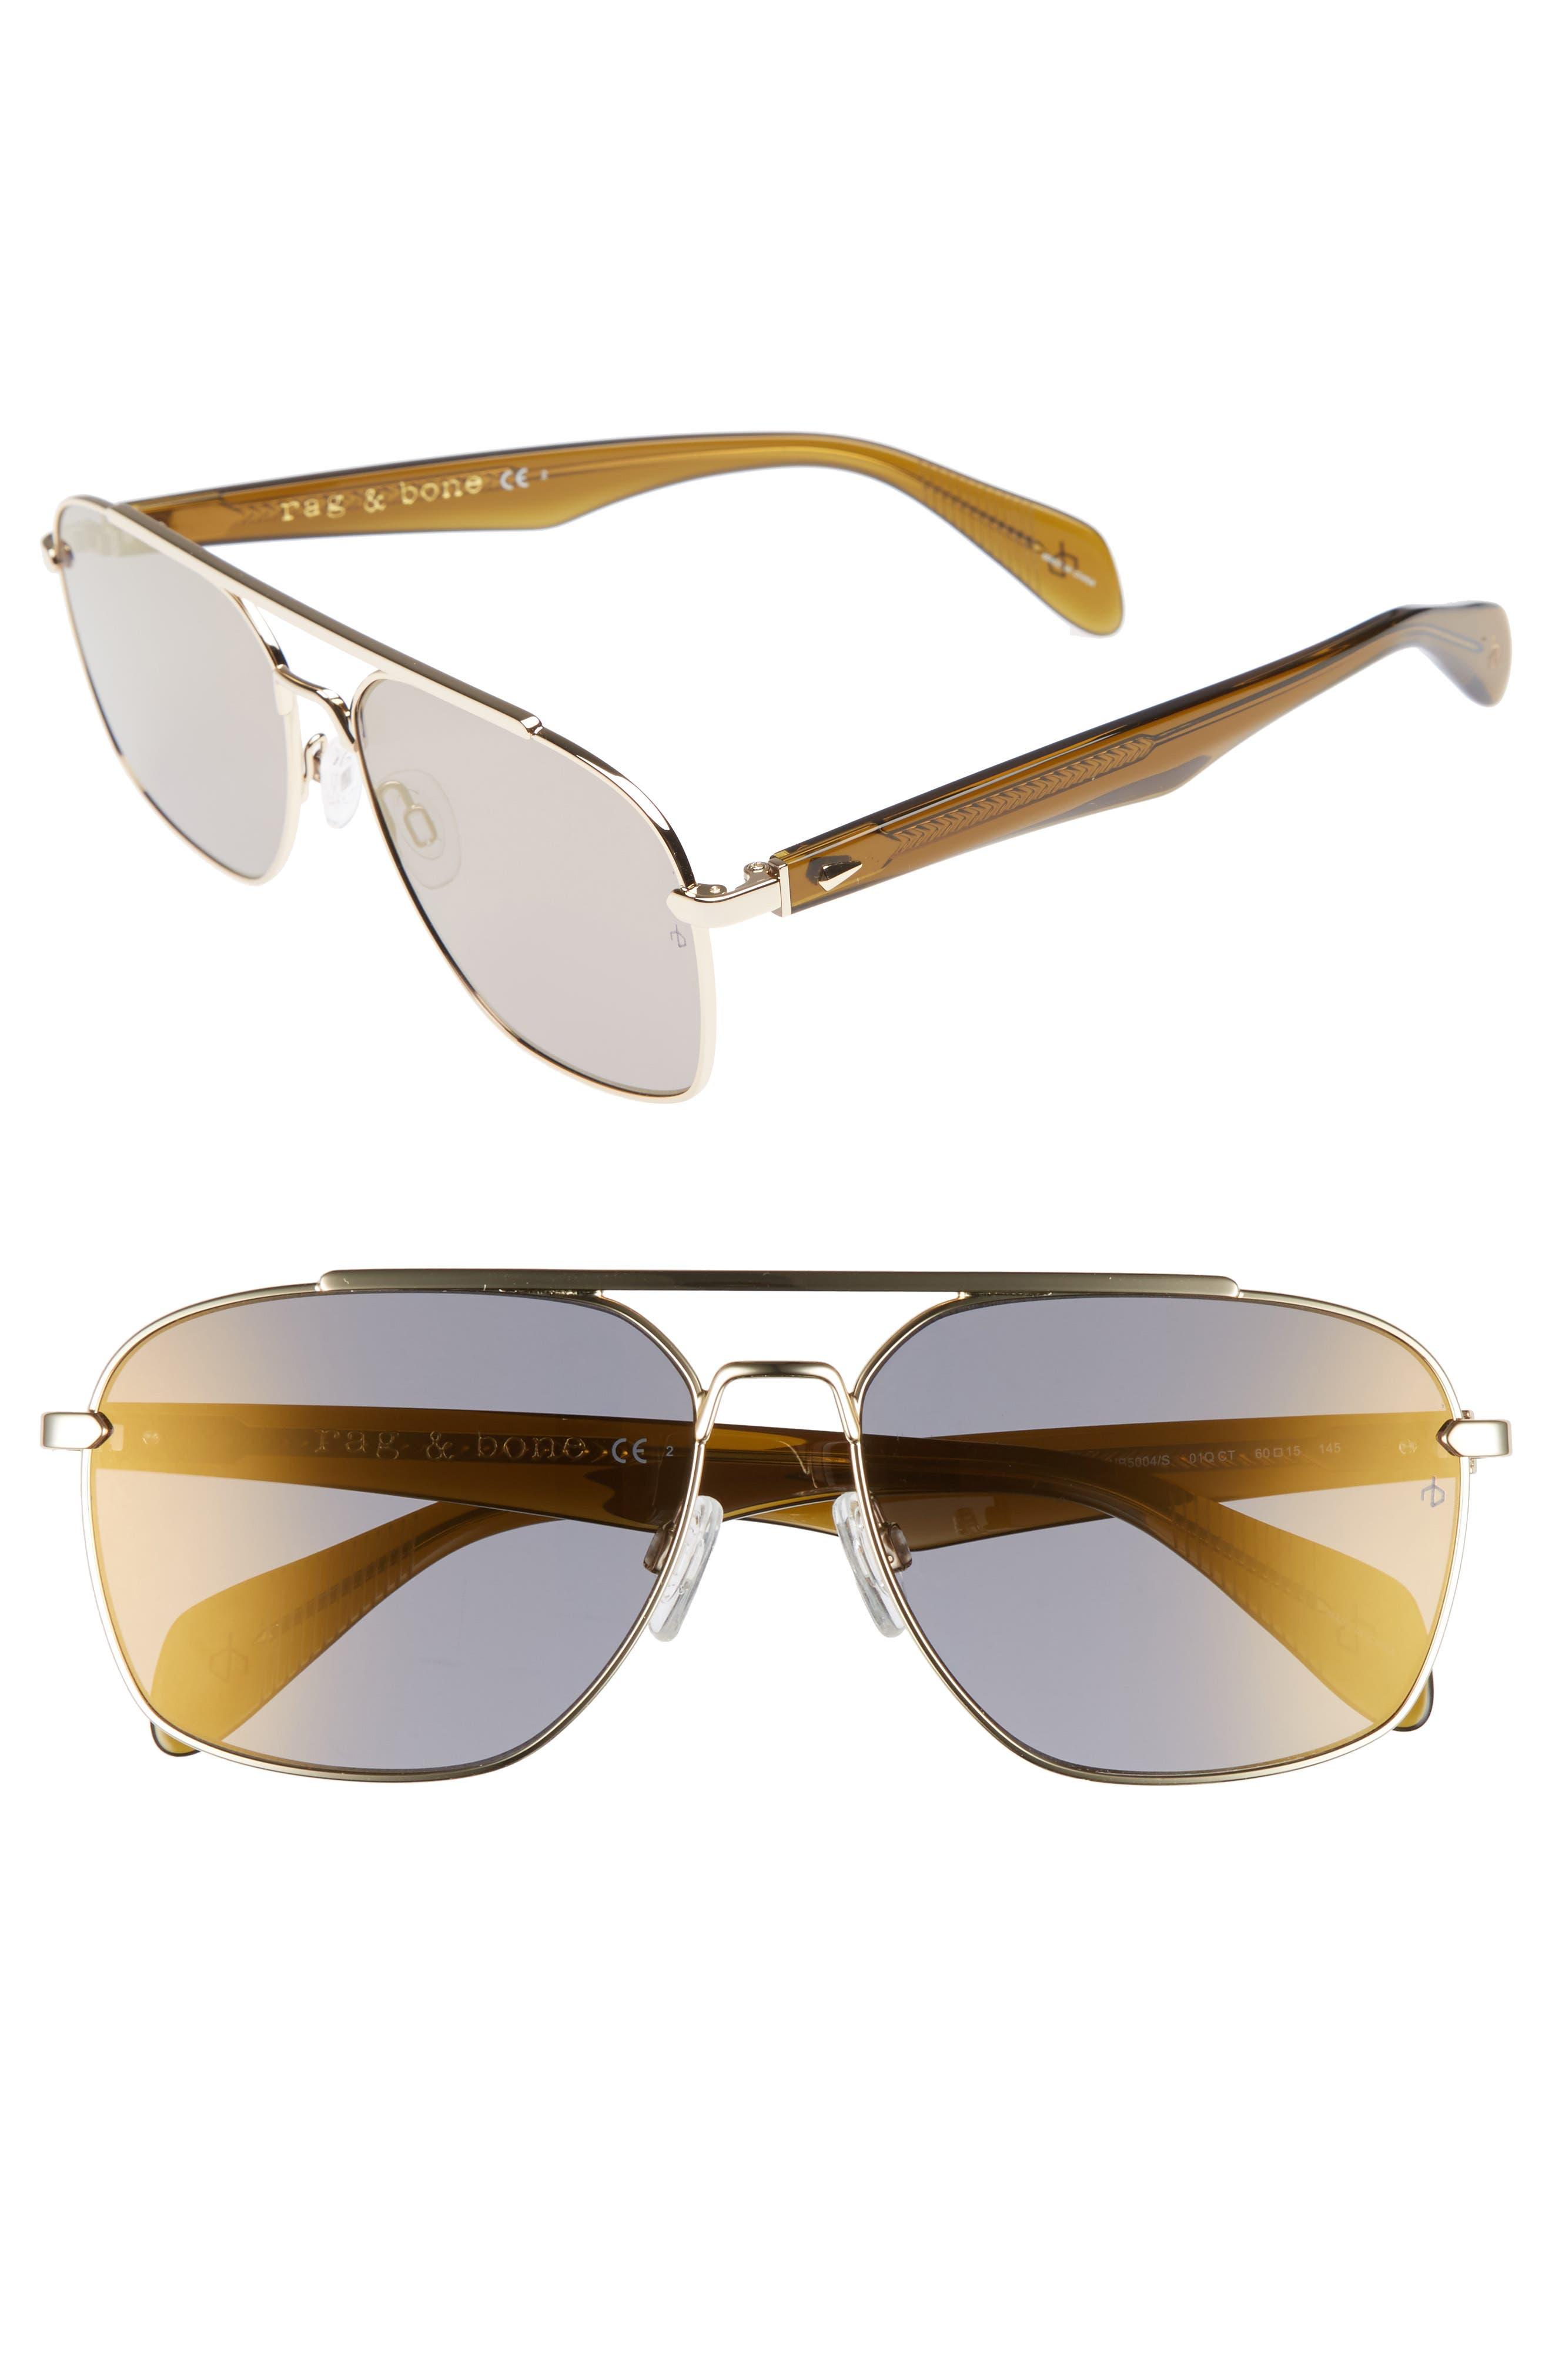 60mm Navigator Sunglasses,                         Main,                         color, Gold Brown